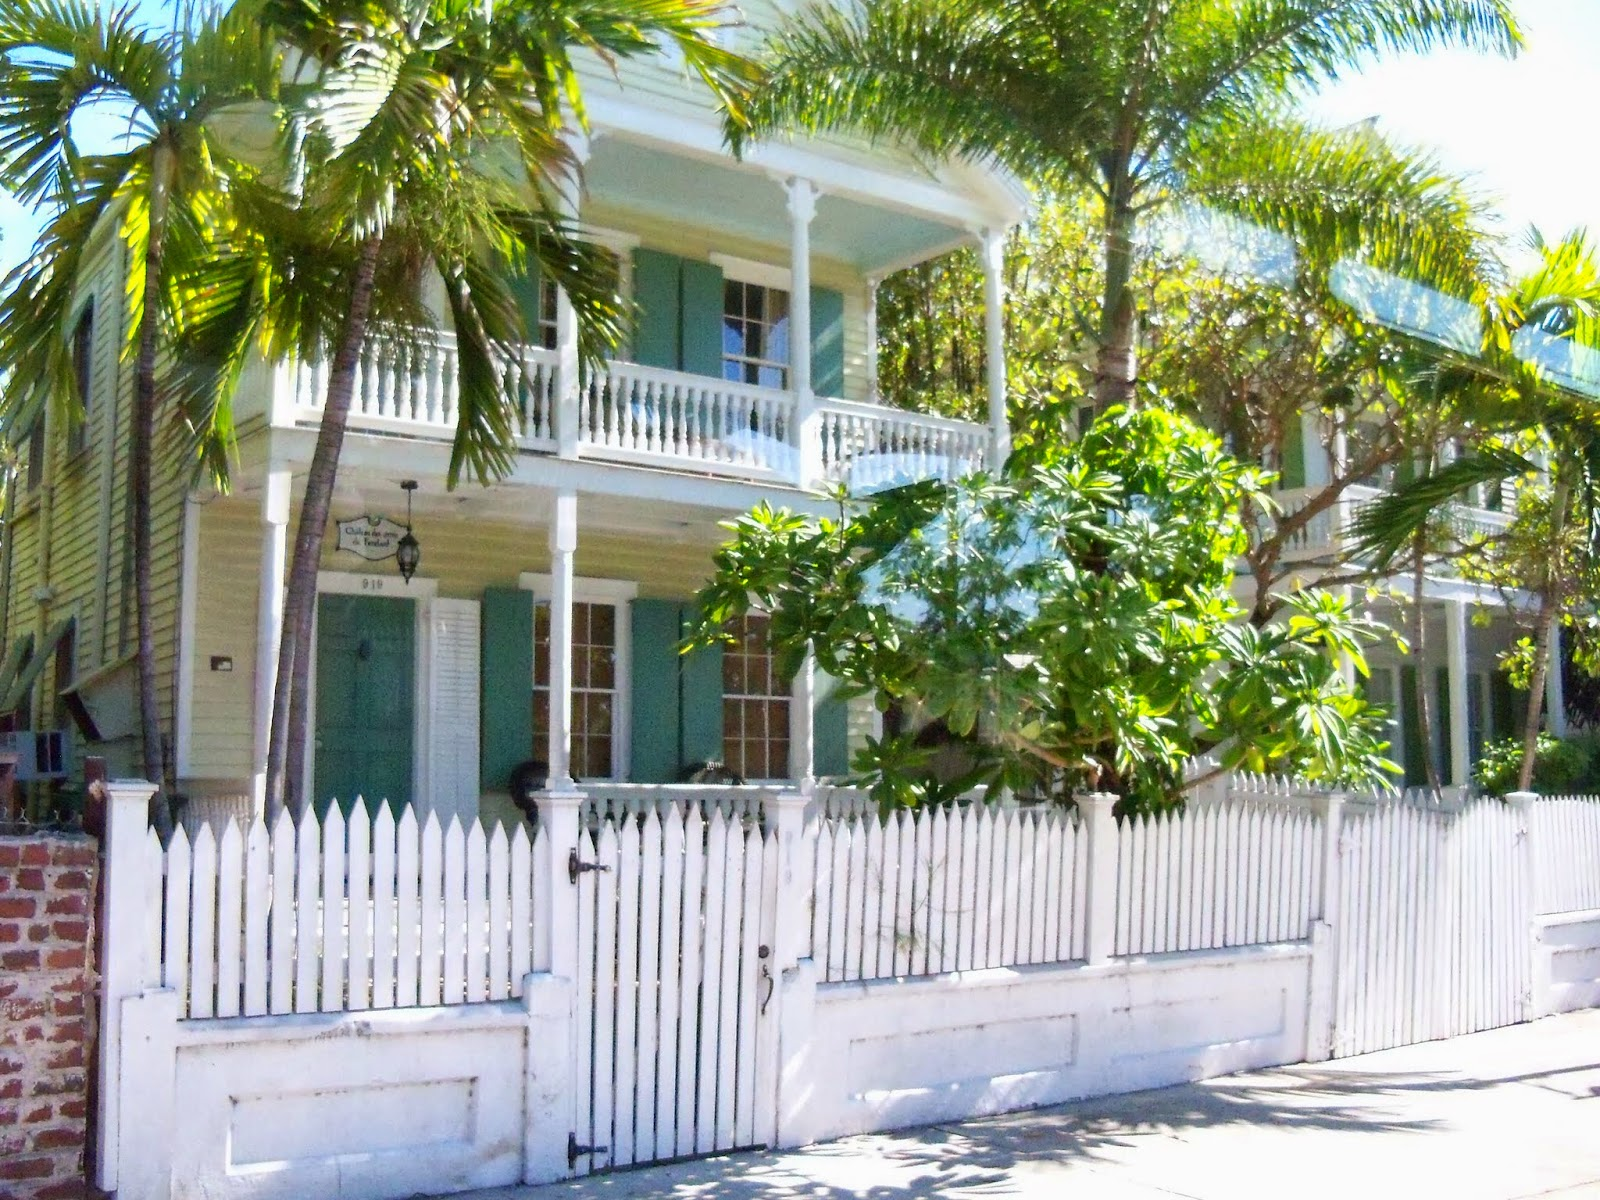 Key West Vacation - 116_5745.JPG